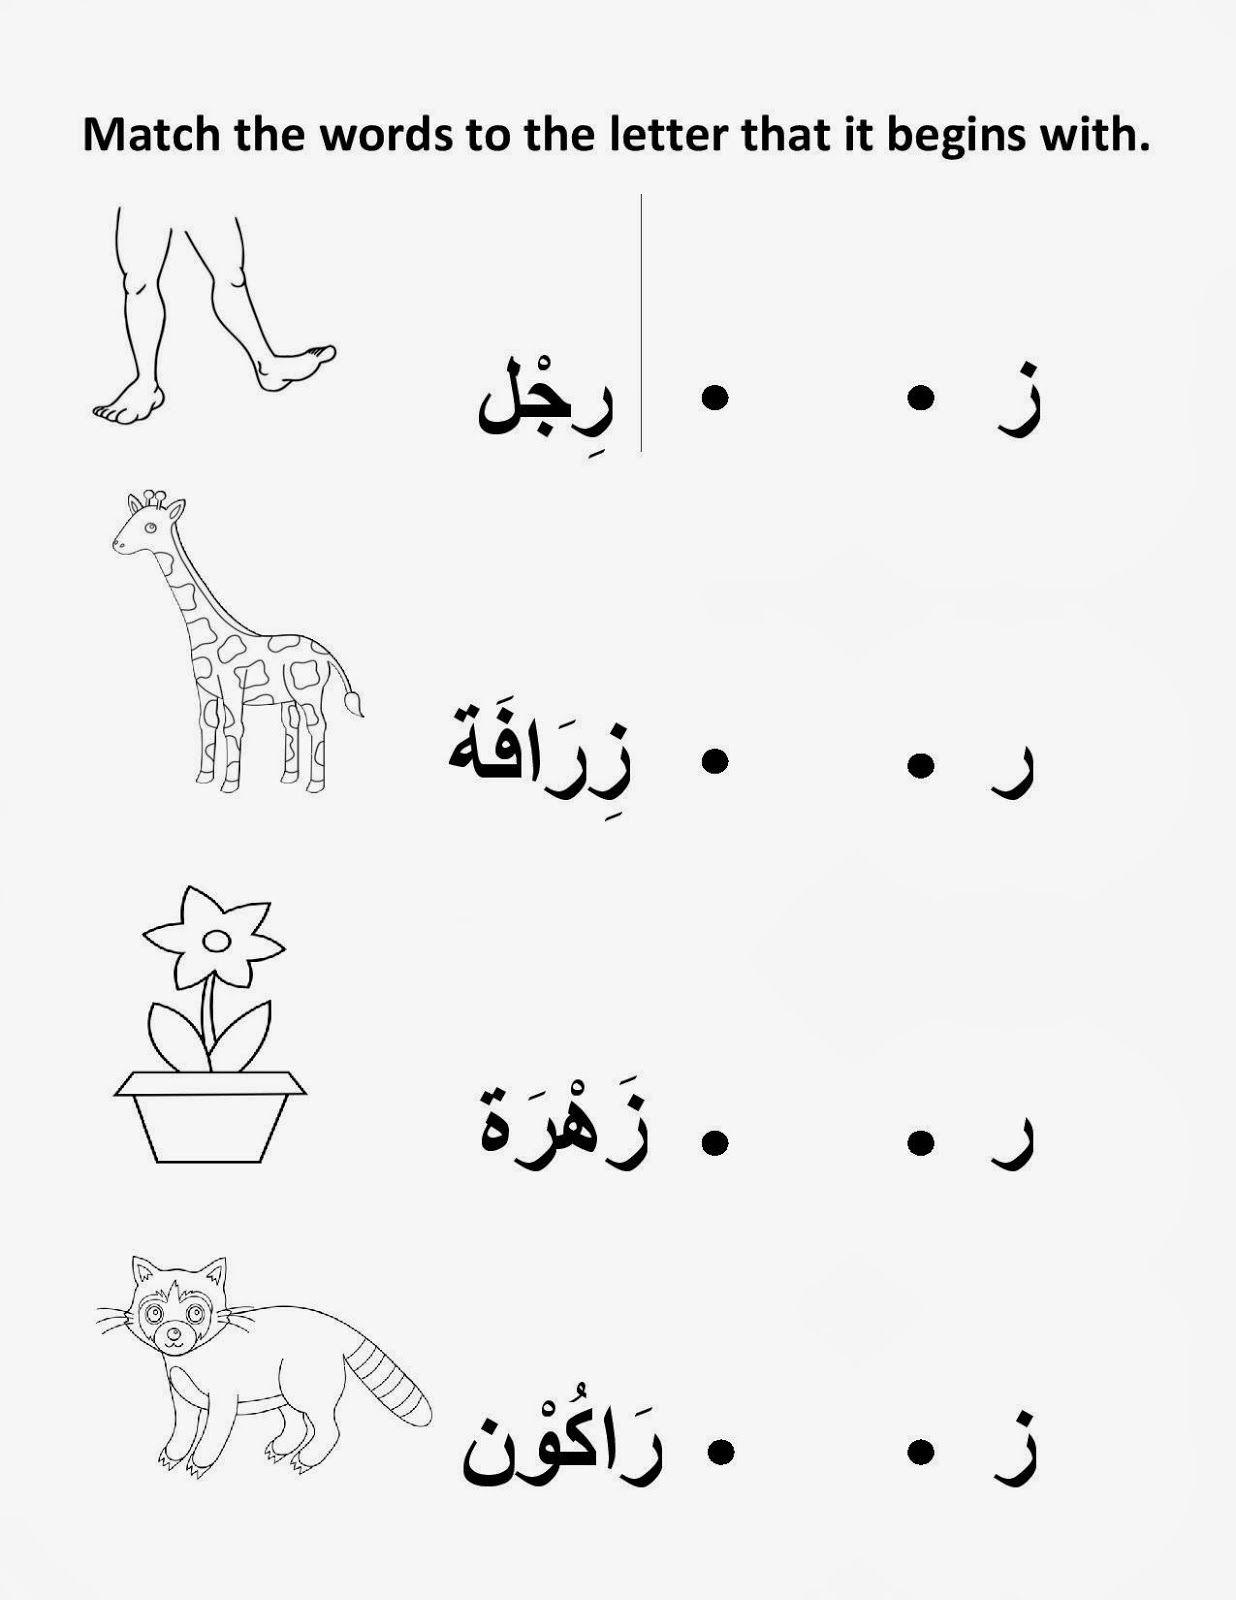 Arabic Alphabet Worksheets for Preschoolers Iqra Alif Ba Ta Worksheet for Kids 11 Oct 2013 มี